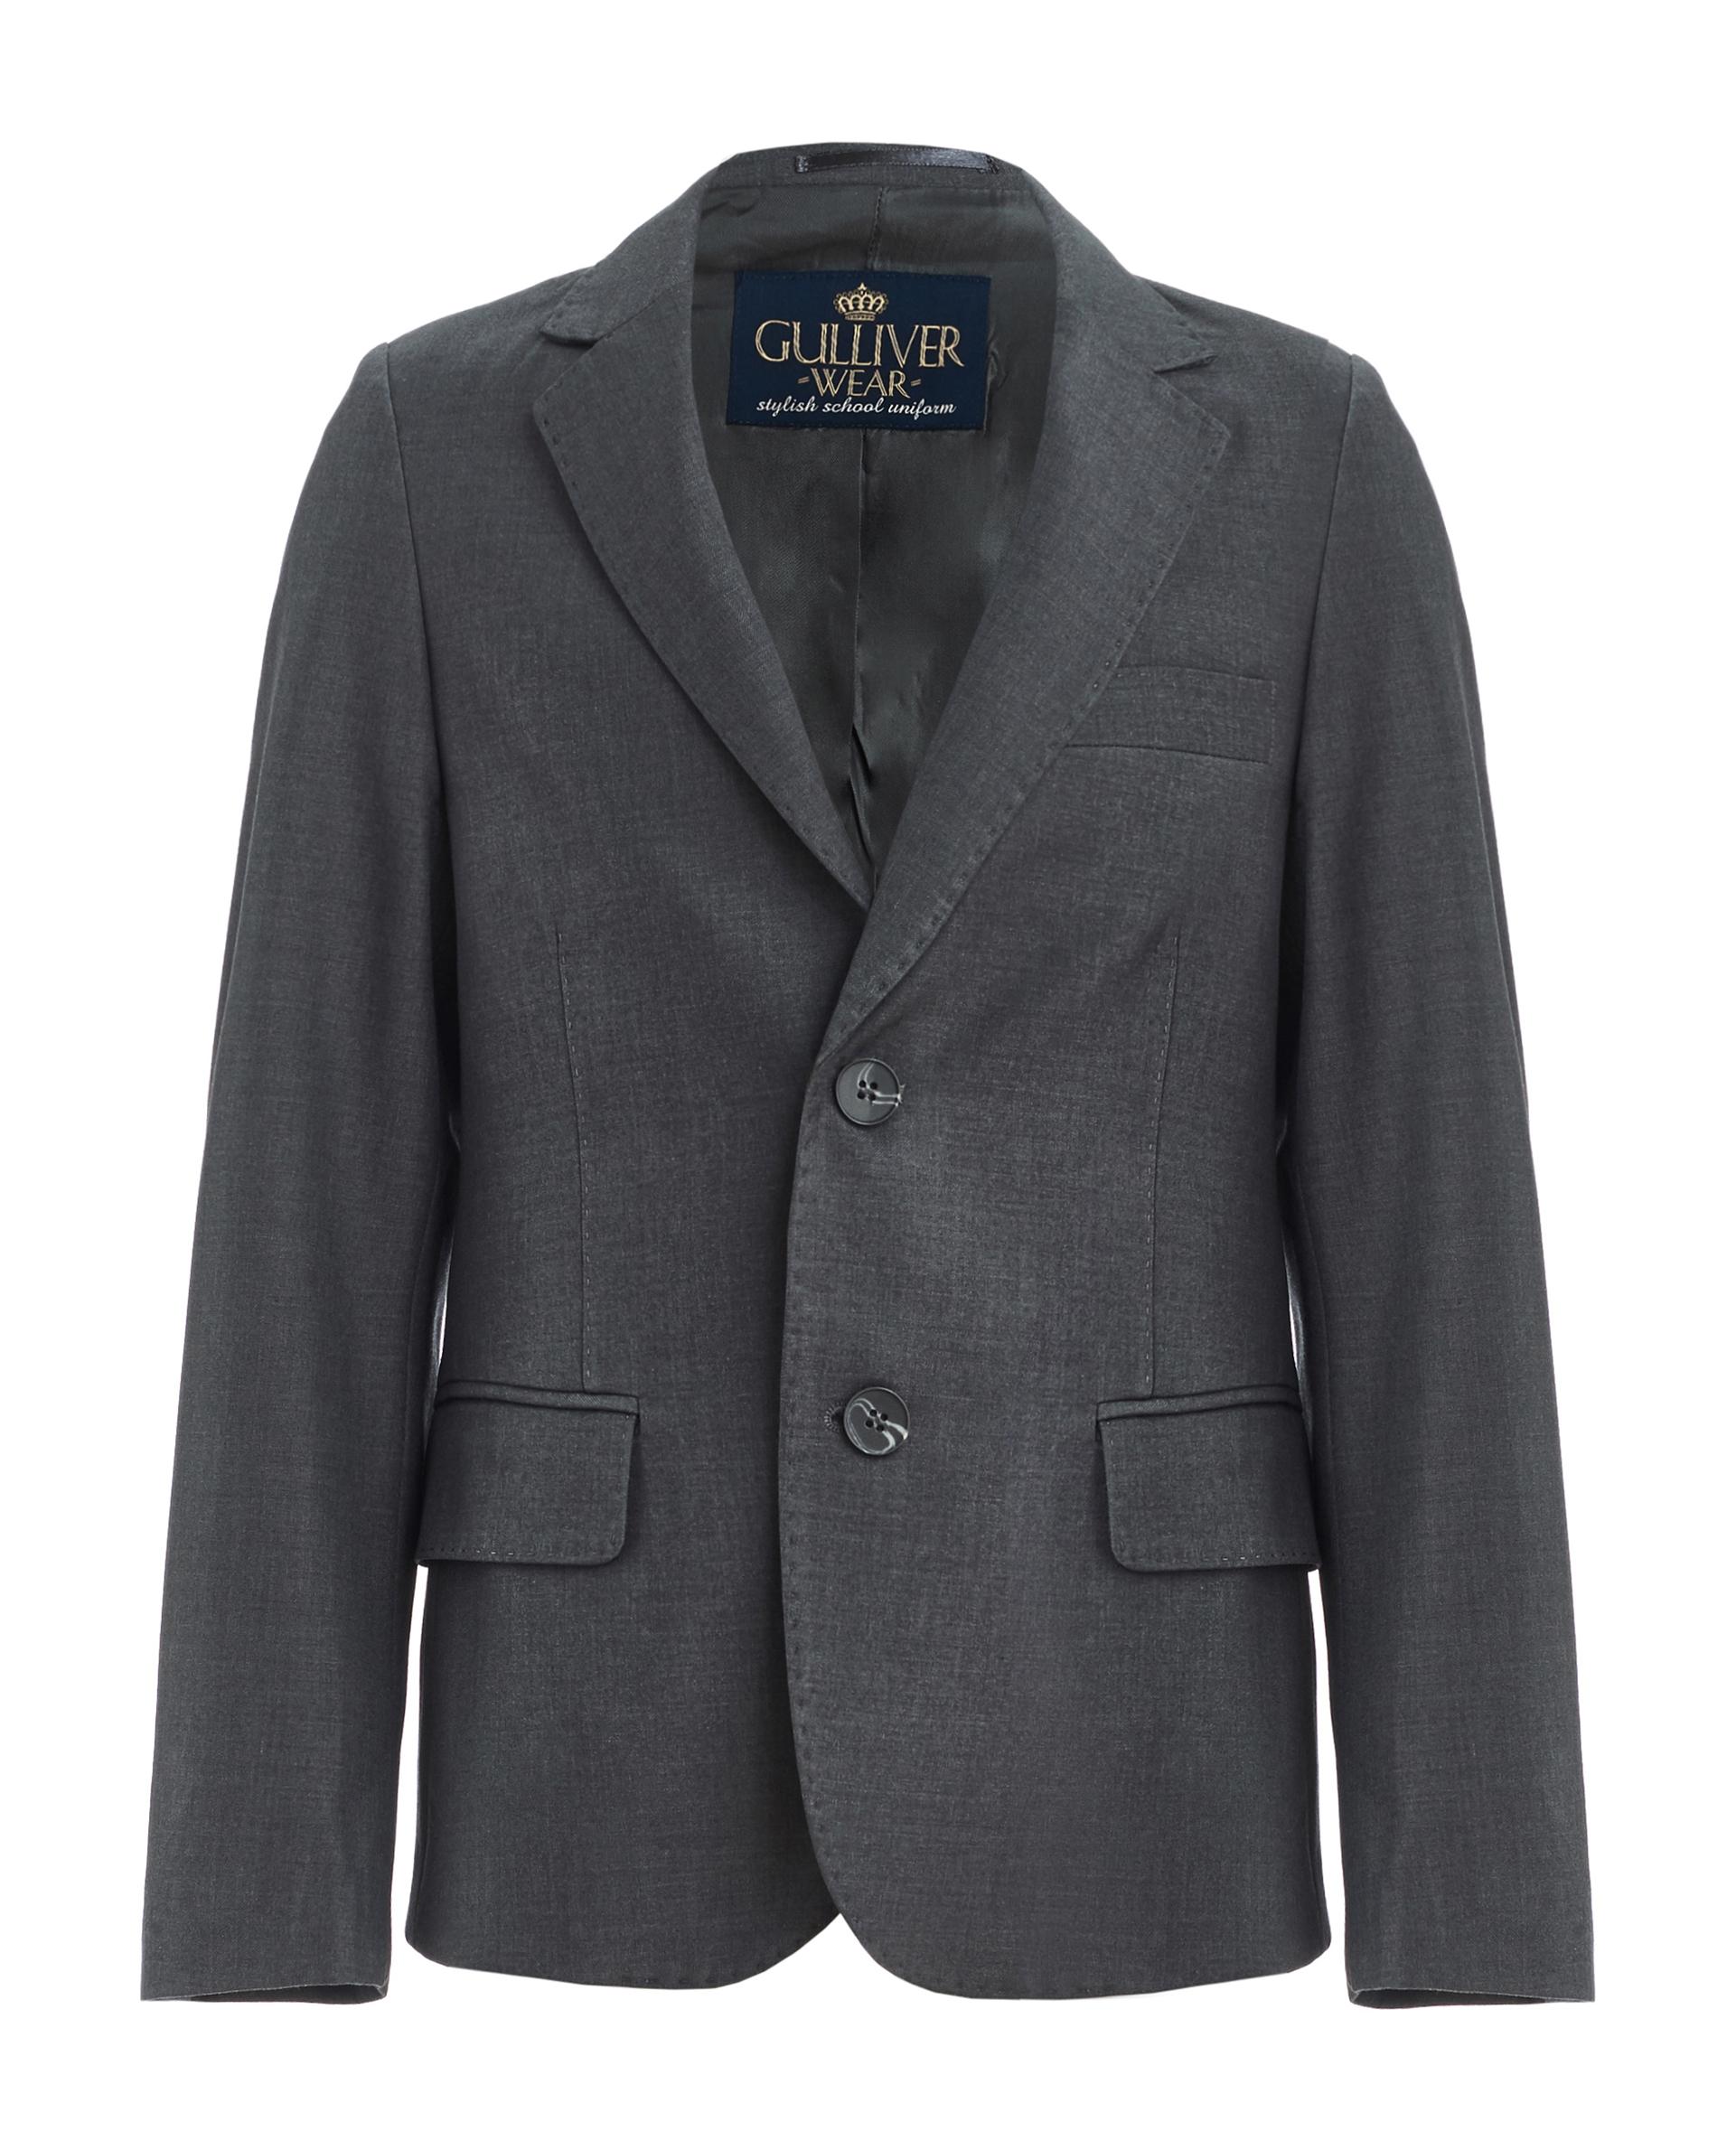 Купить 219GSBC4803, Серый пиджак Gulliver, серый, 140, Мужской, ШКОЛЬНАЯ ФОРМА 2019-2020 (shop: GulliverMarket Gulliver Market)